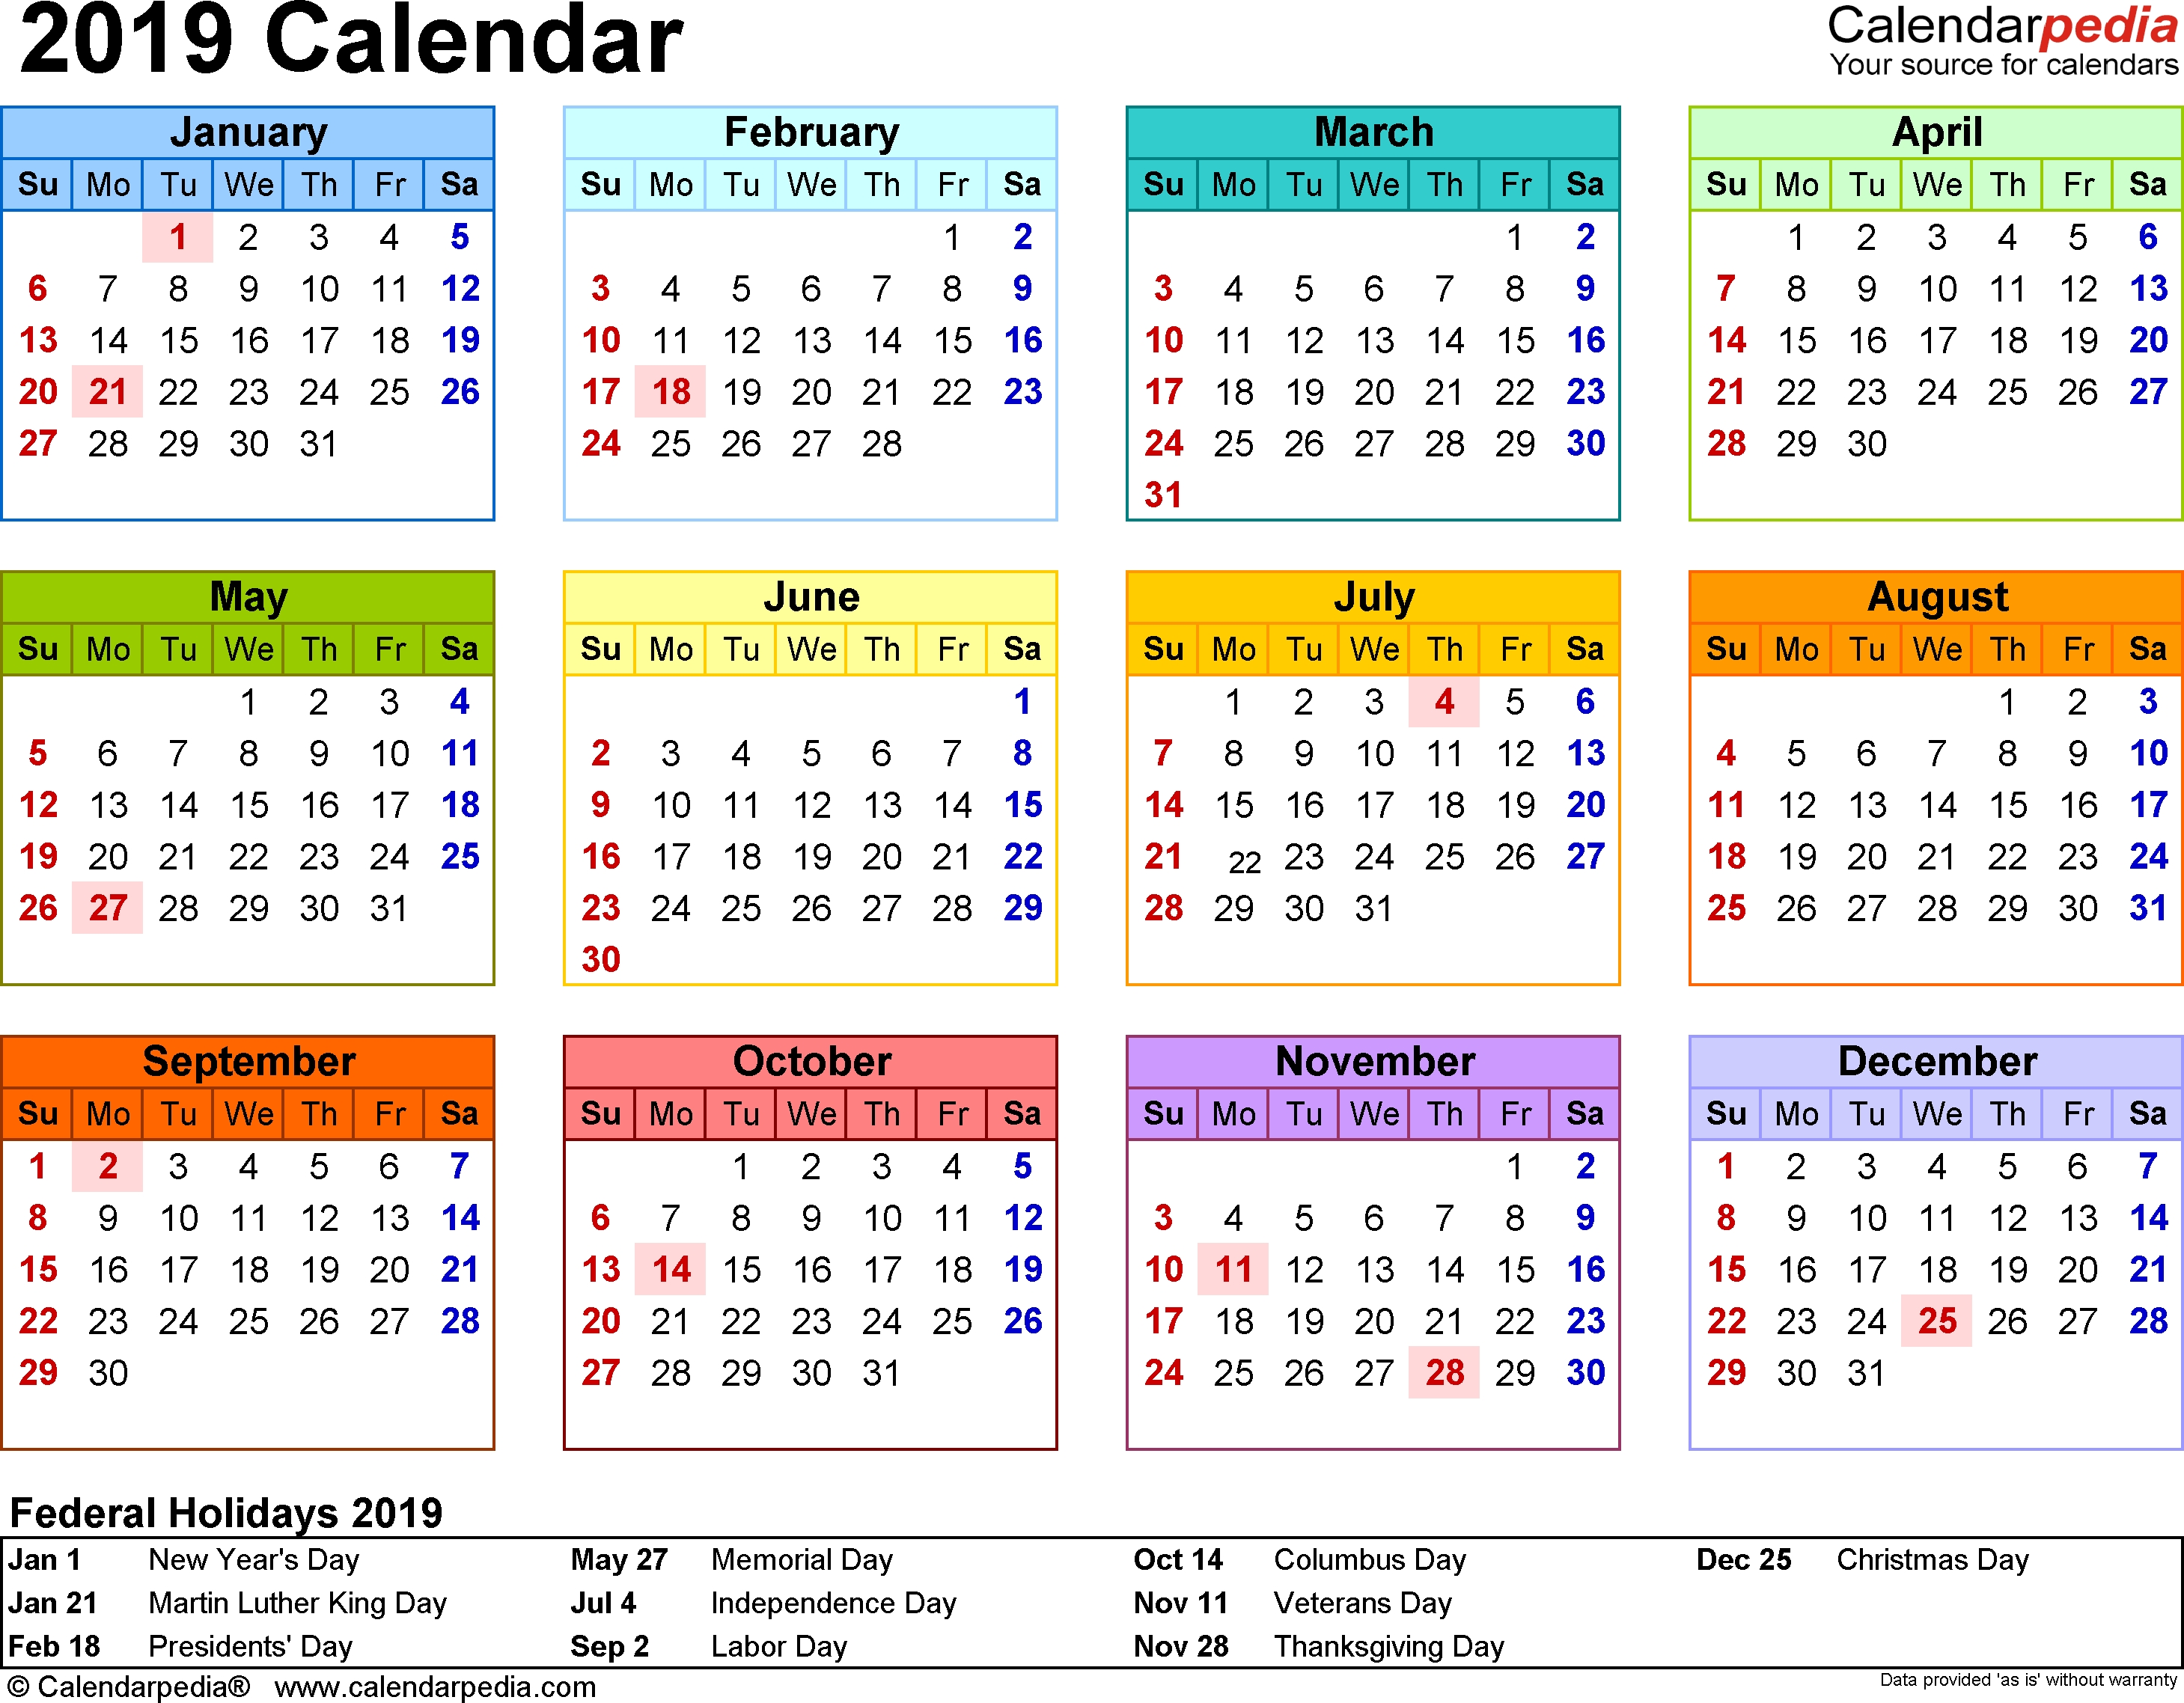 2019 Calendar Pdf - 17 Free Printable Calendar Templates within Year At A Glance Calendar